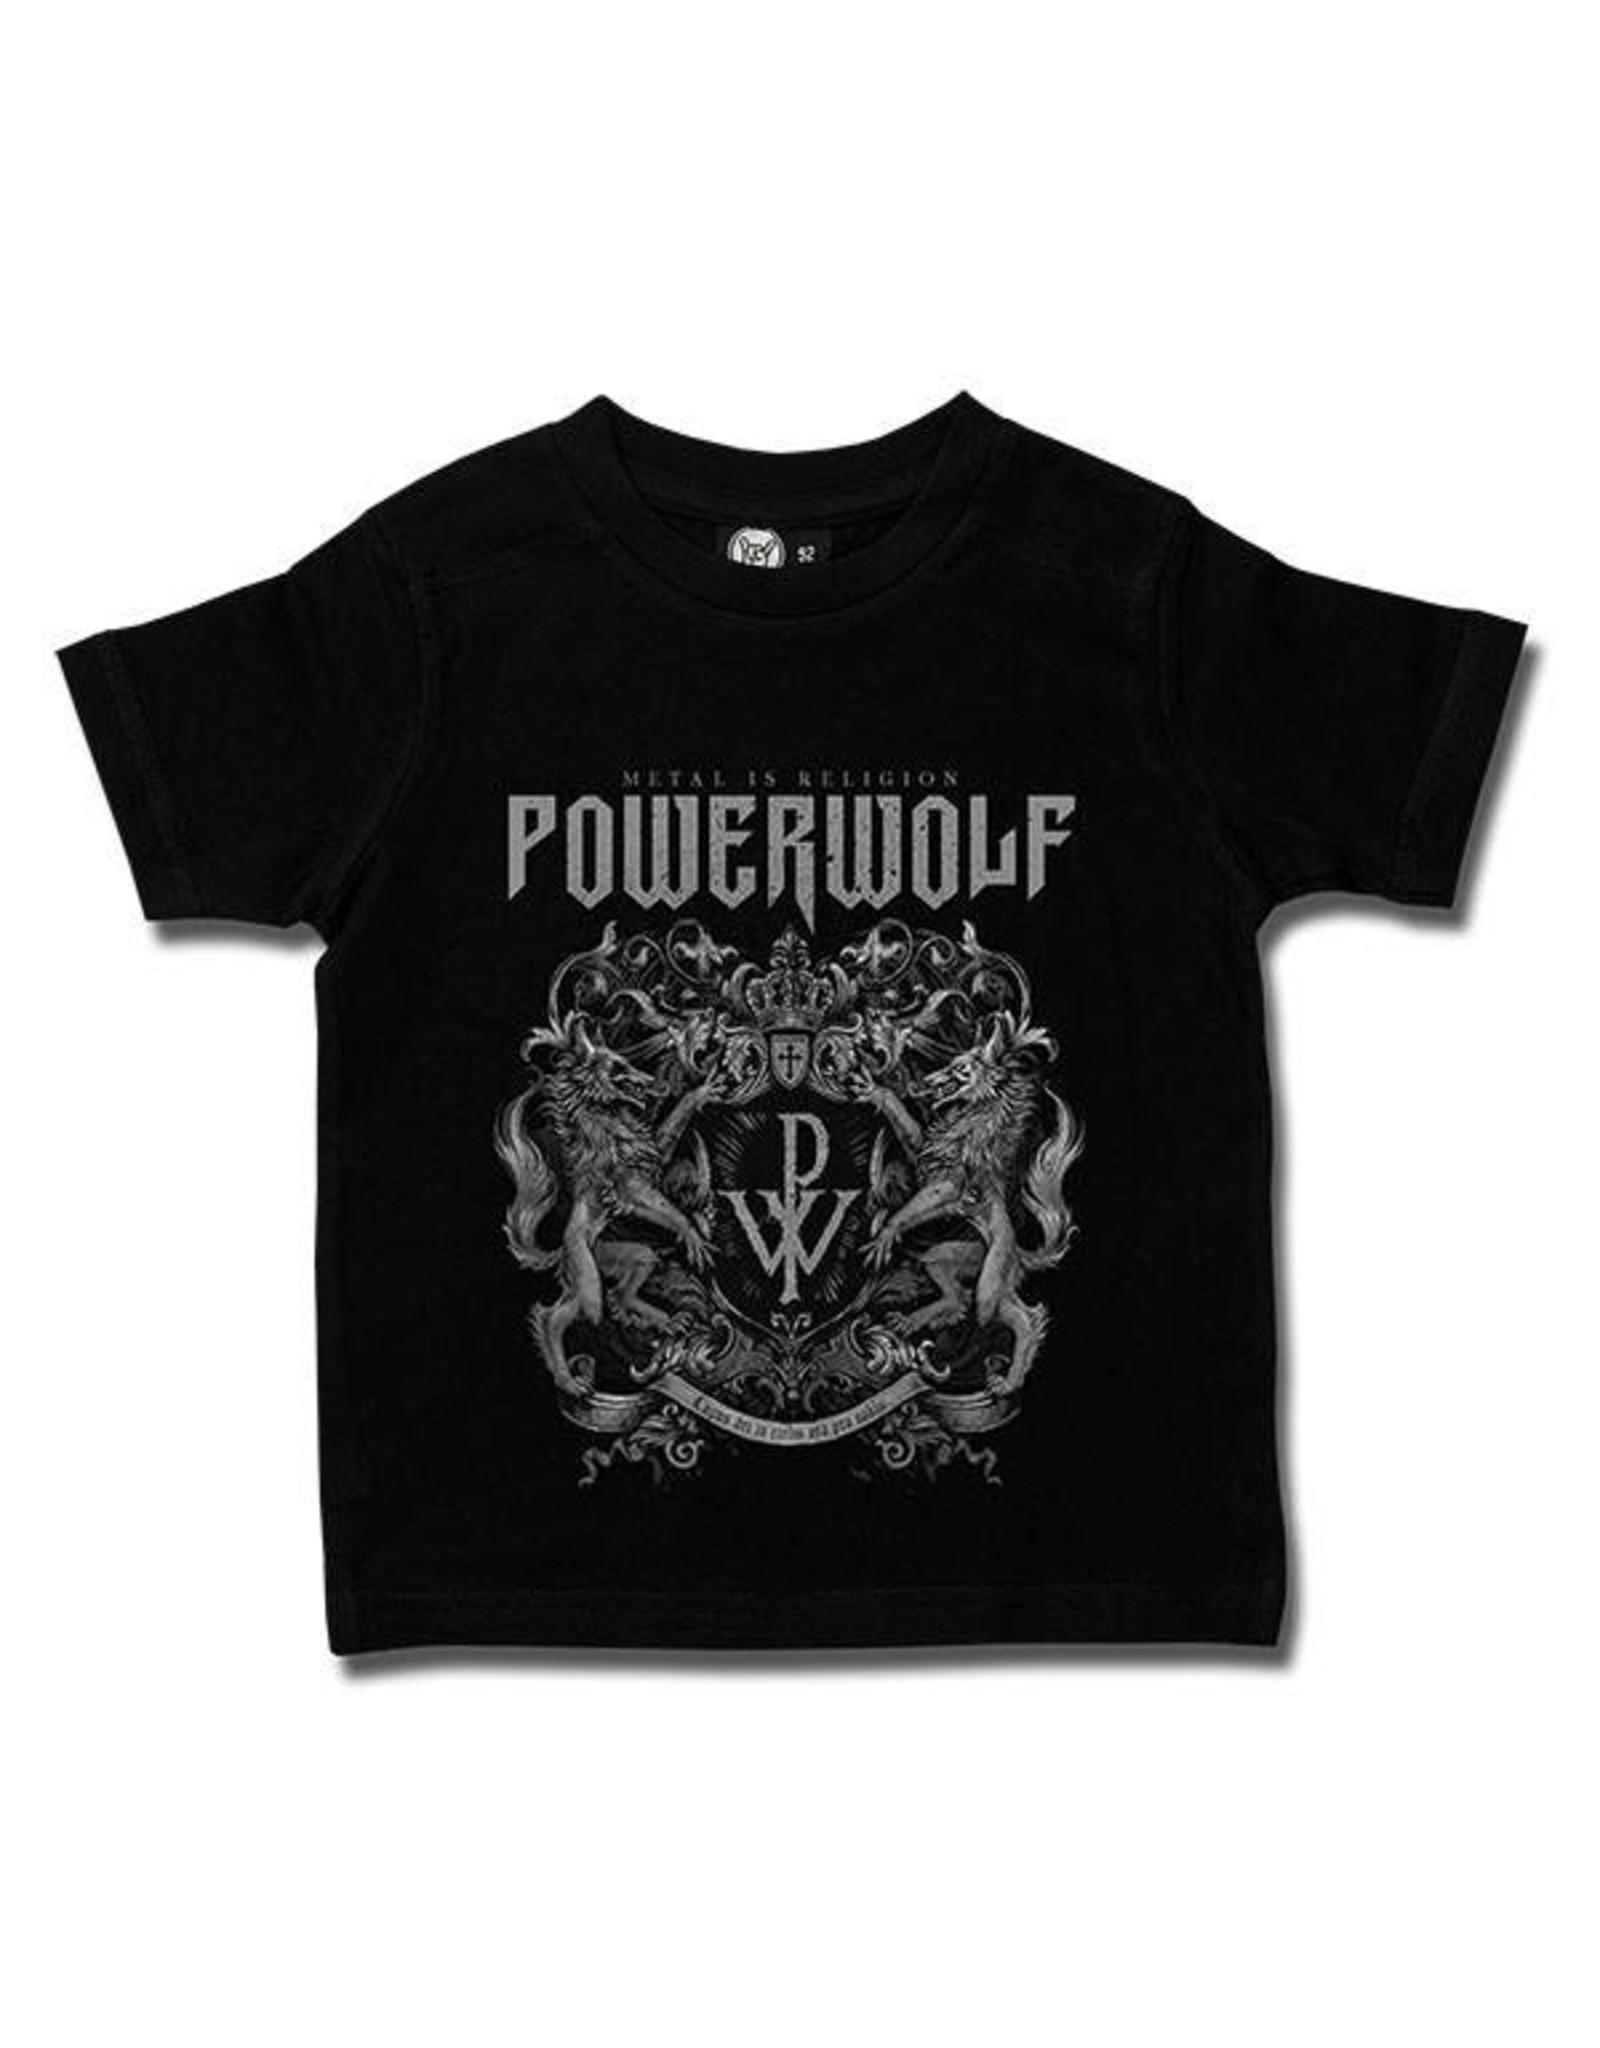 Powerwolf (Crest) - Kids T-Shirt